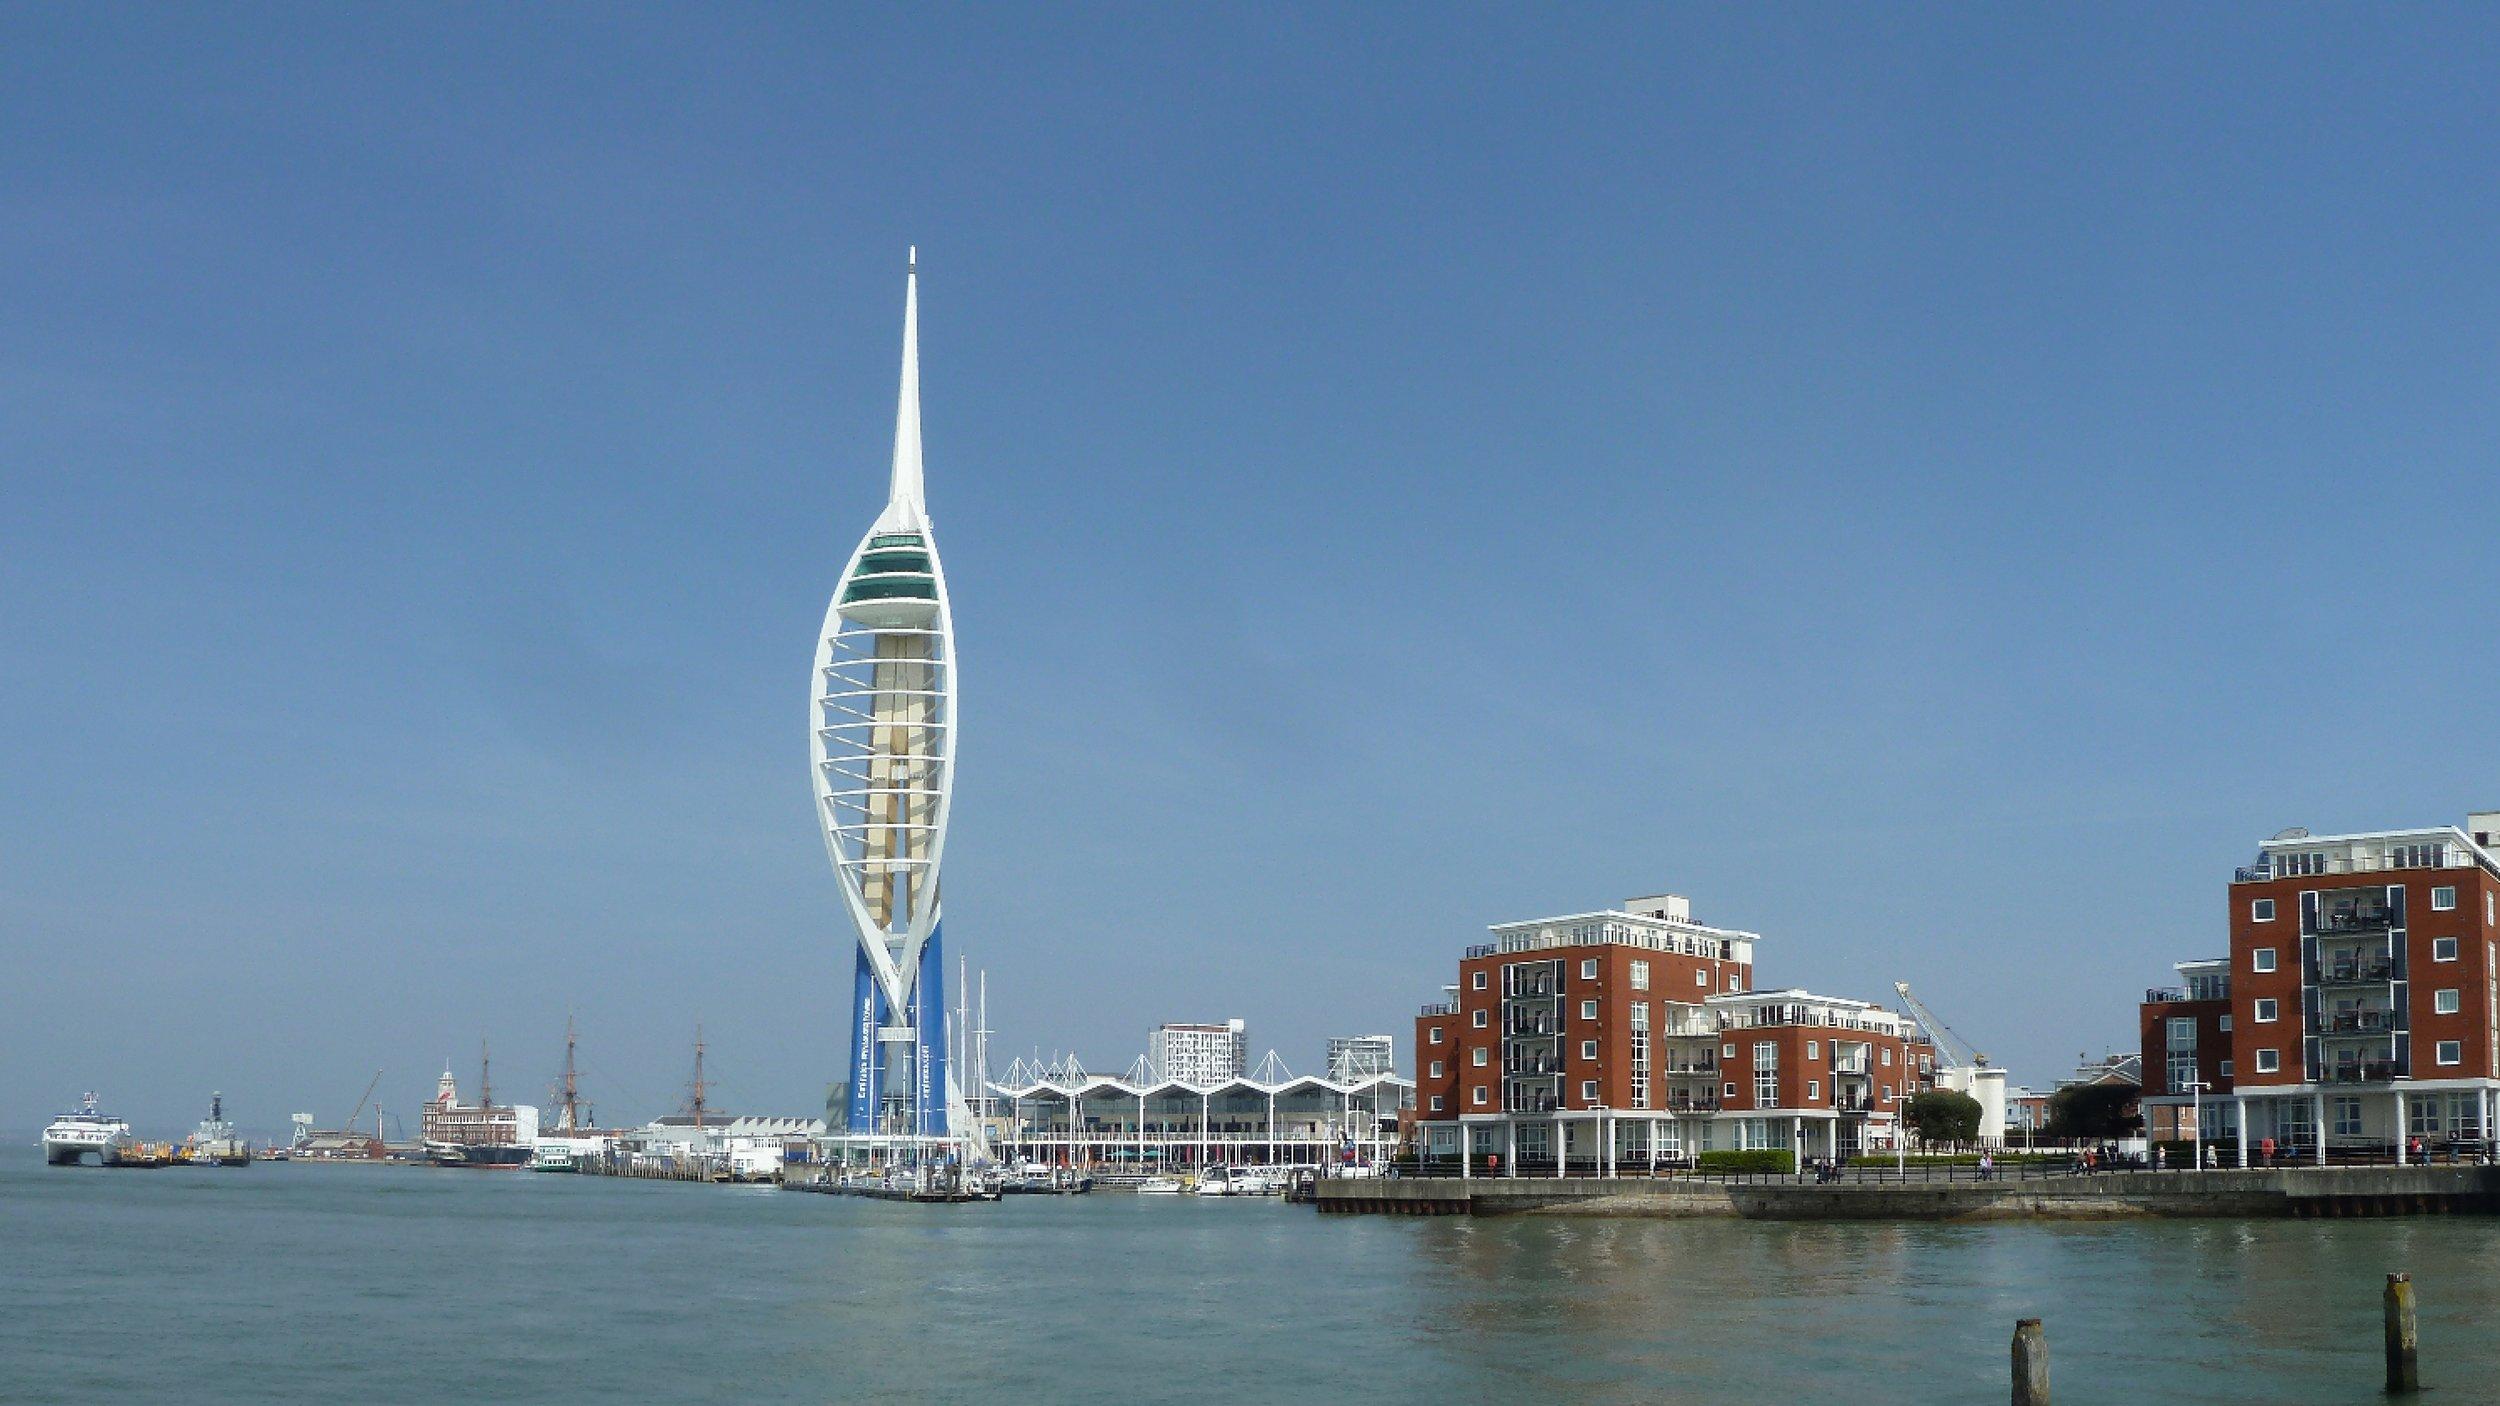 Conference Surrounding Area, Portsmouth, UK